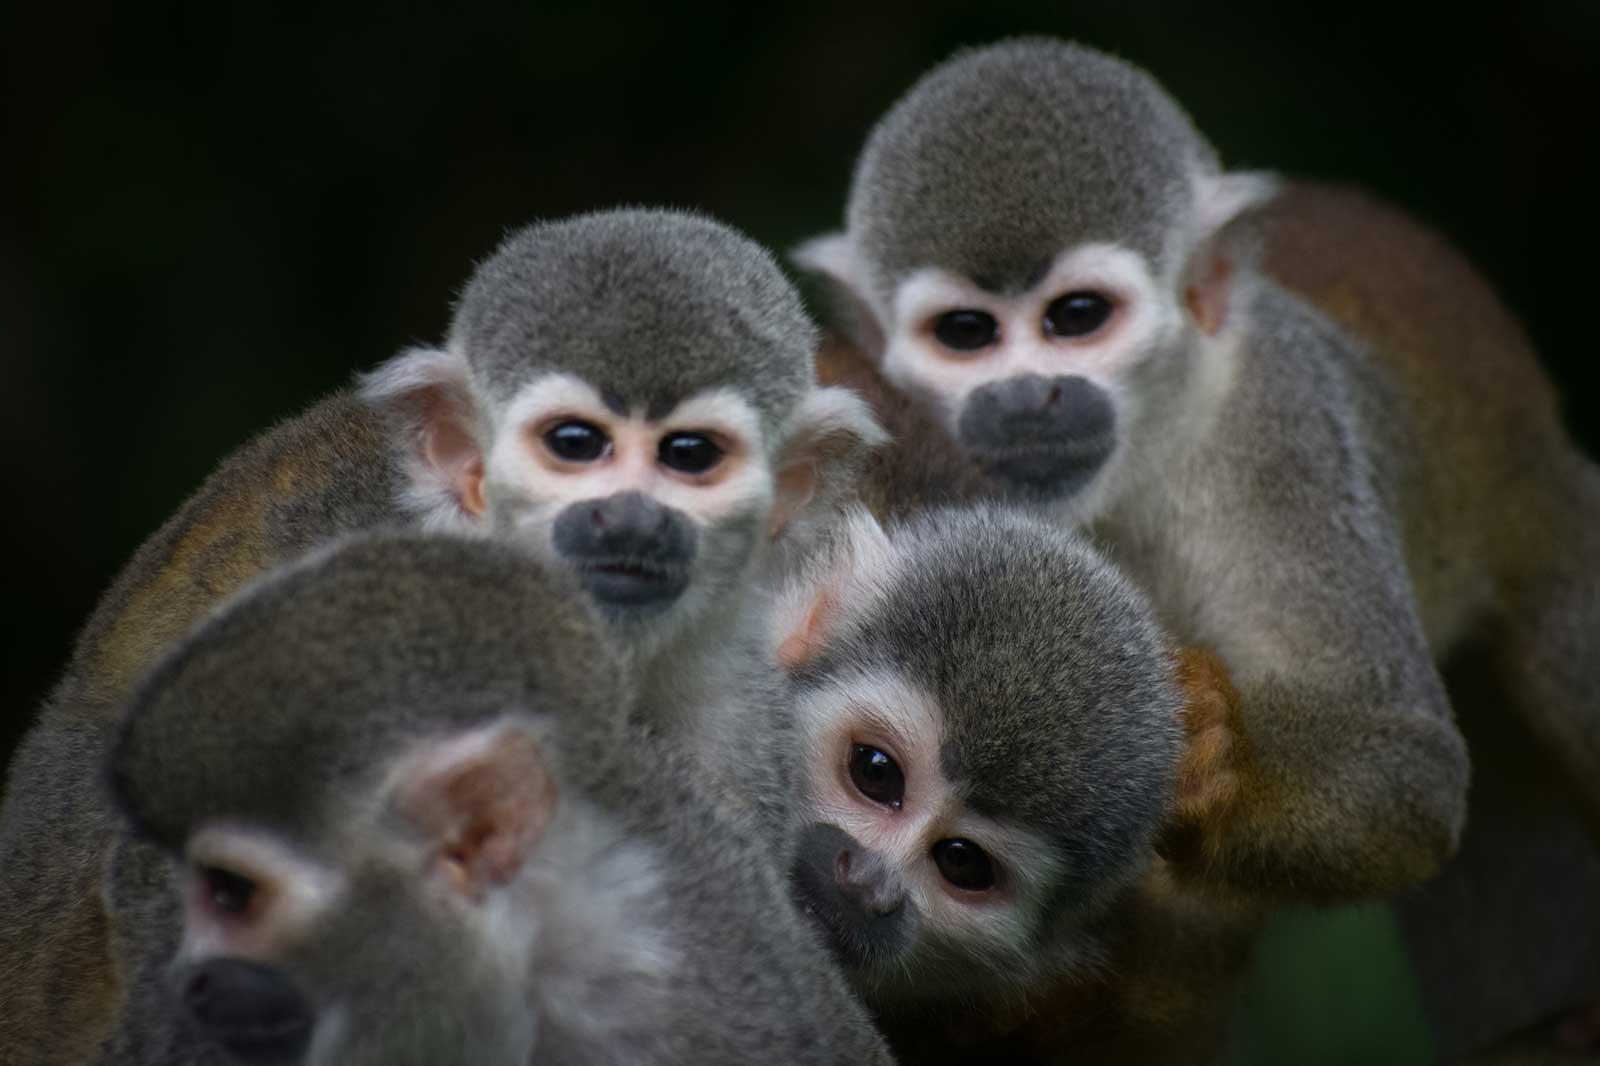 Marmoset monkey or squirrel monkey (<i>Saimiri cassiquiarensis</i>)